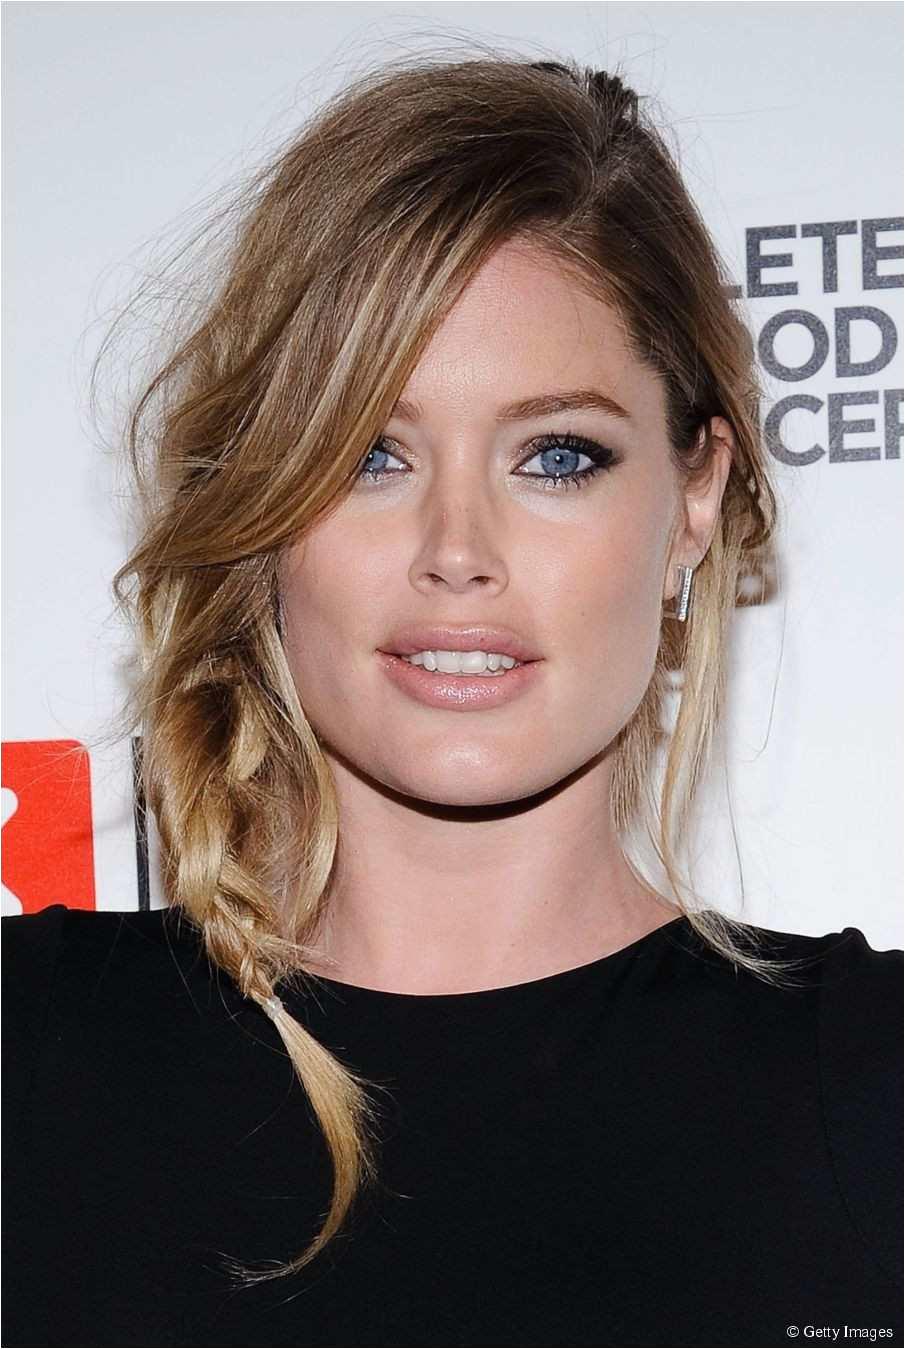 Simple Elegant Haircuts for Long Fine Thin Hair Best Pretty Braided Hairstyles for Thin Hair Inspirational